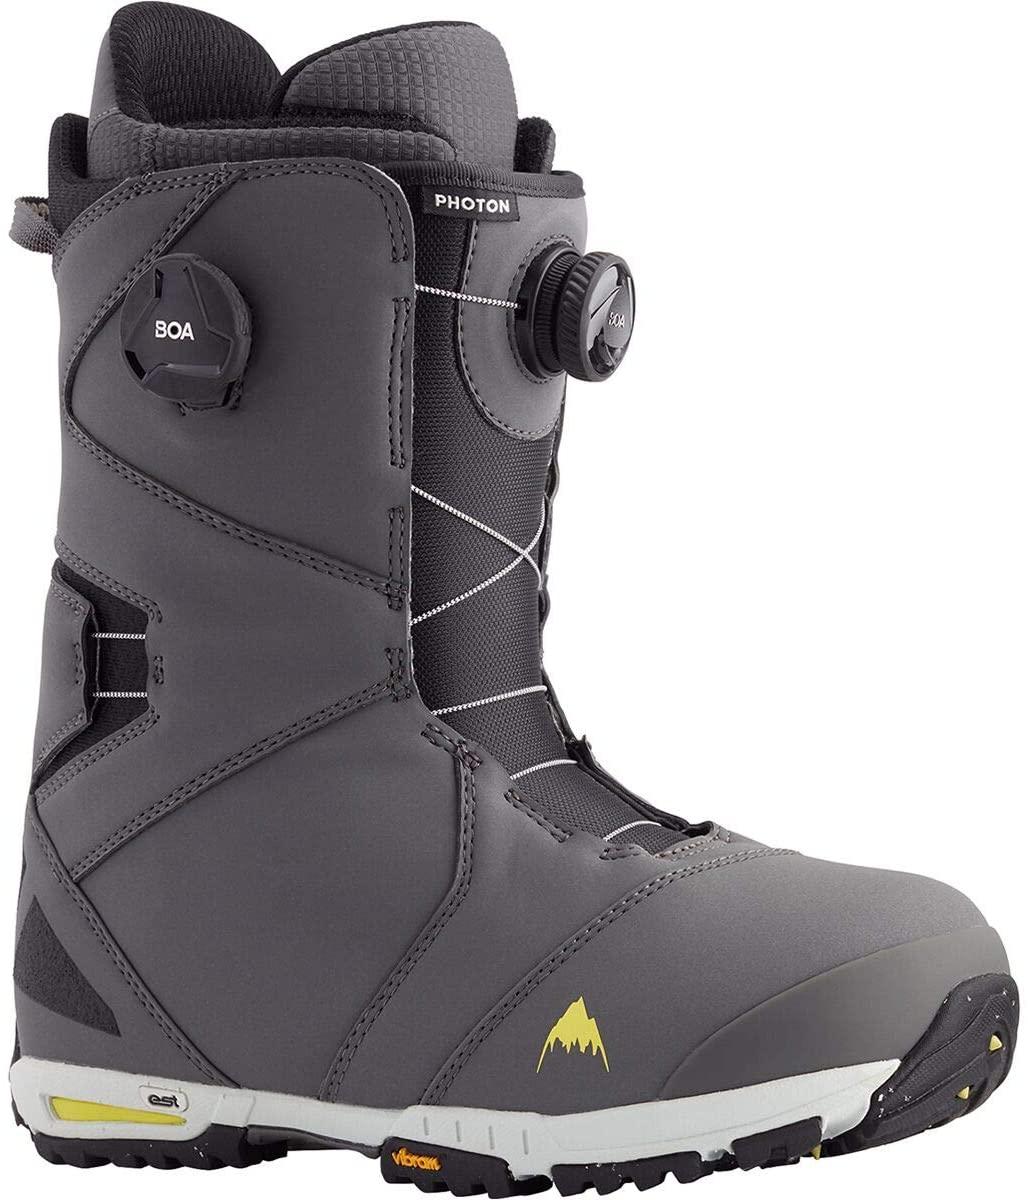 Burton Photon Boa Snowboard Boot - Men's Gray, 11.5